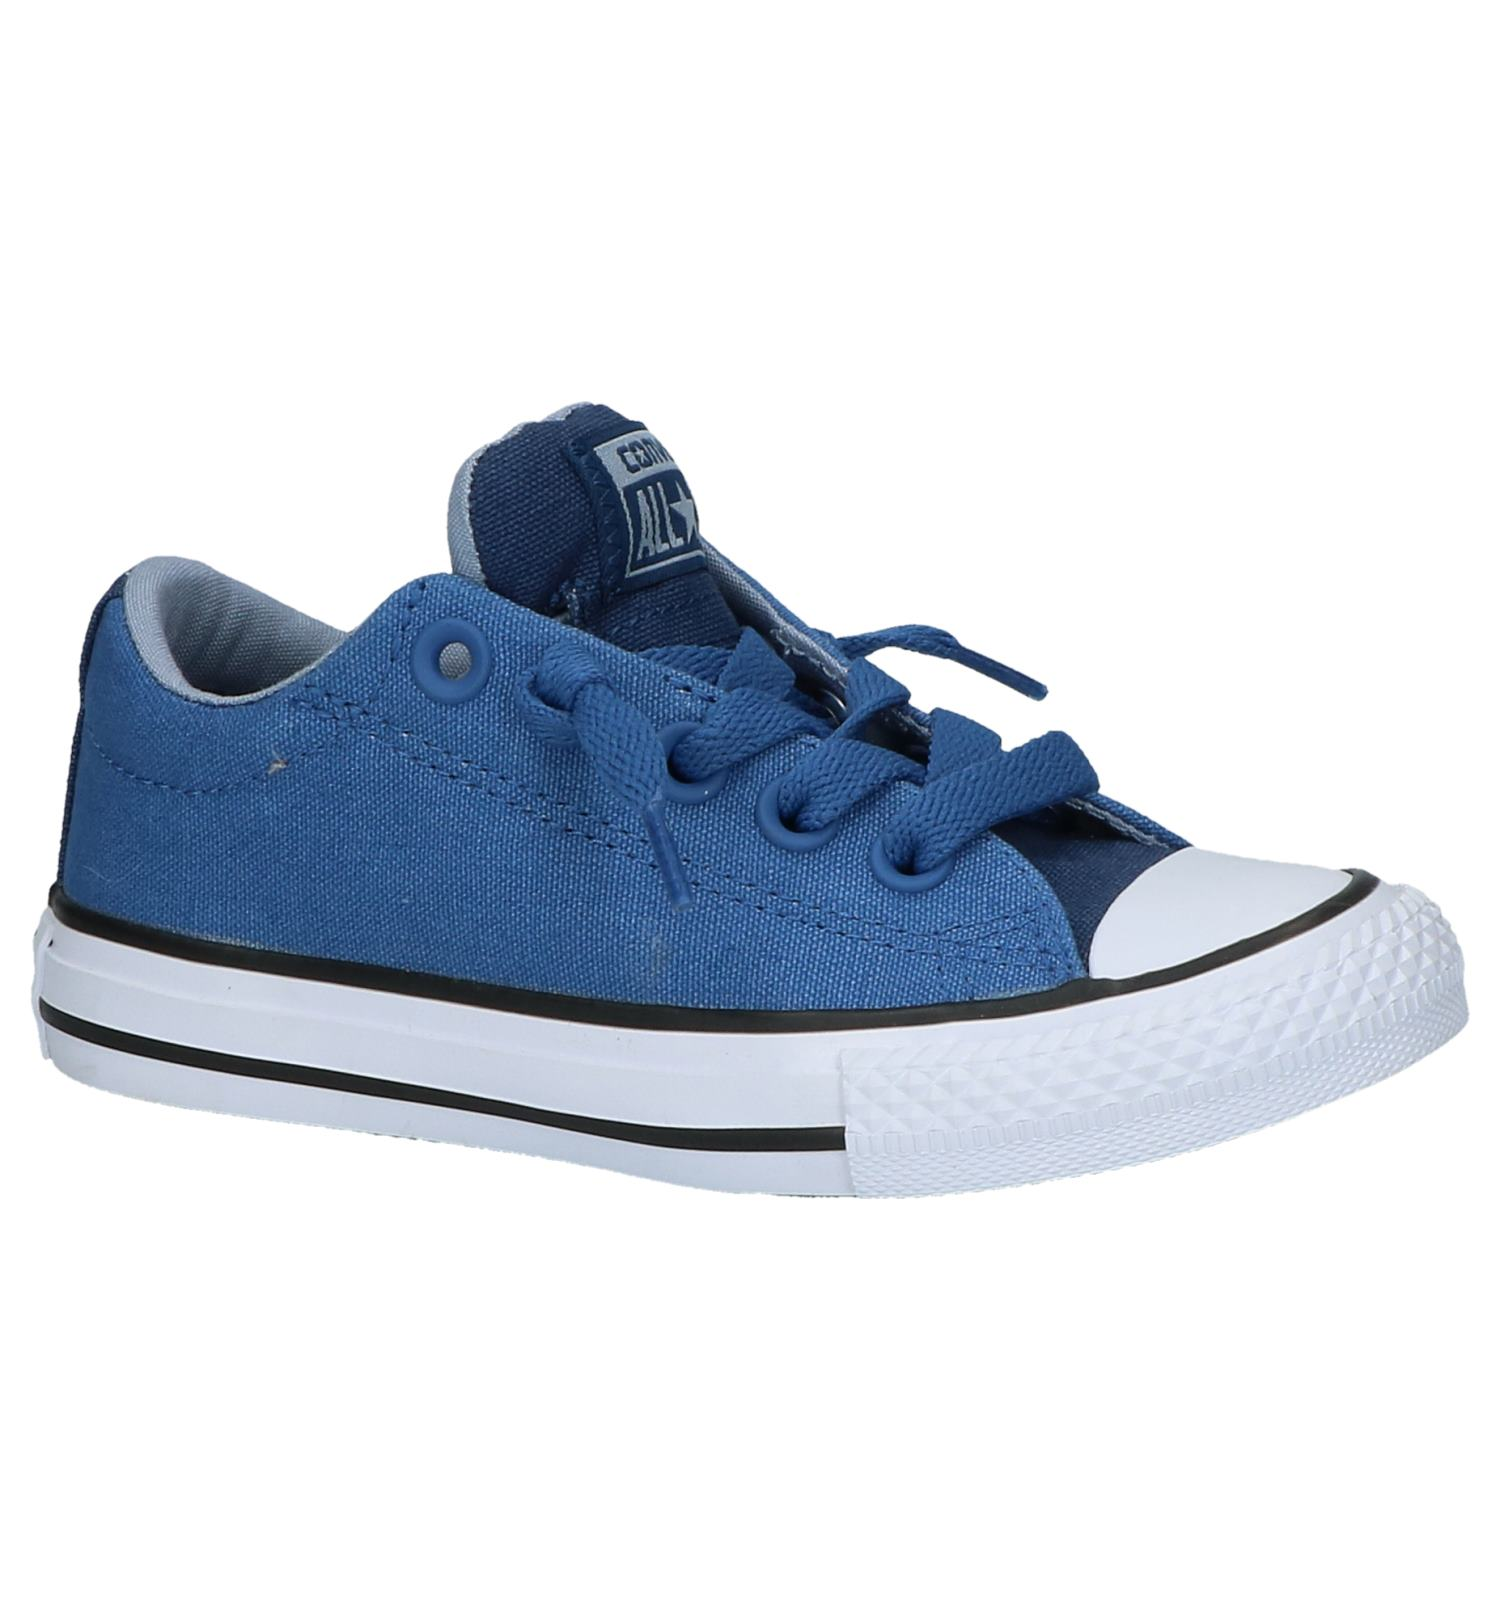 cc2646ec1ab Blauwe Lage Sportieve Sneakers Converse Chuck Taylor All Star Street |  TORFS.BE | Gratis verzend en retour